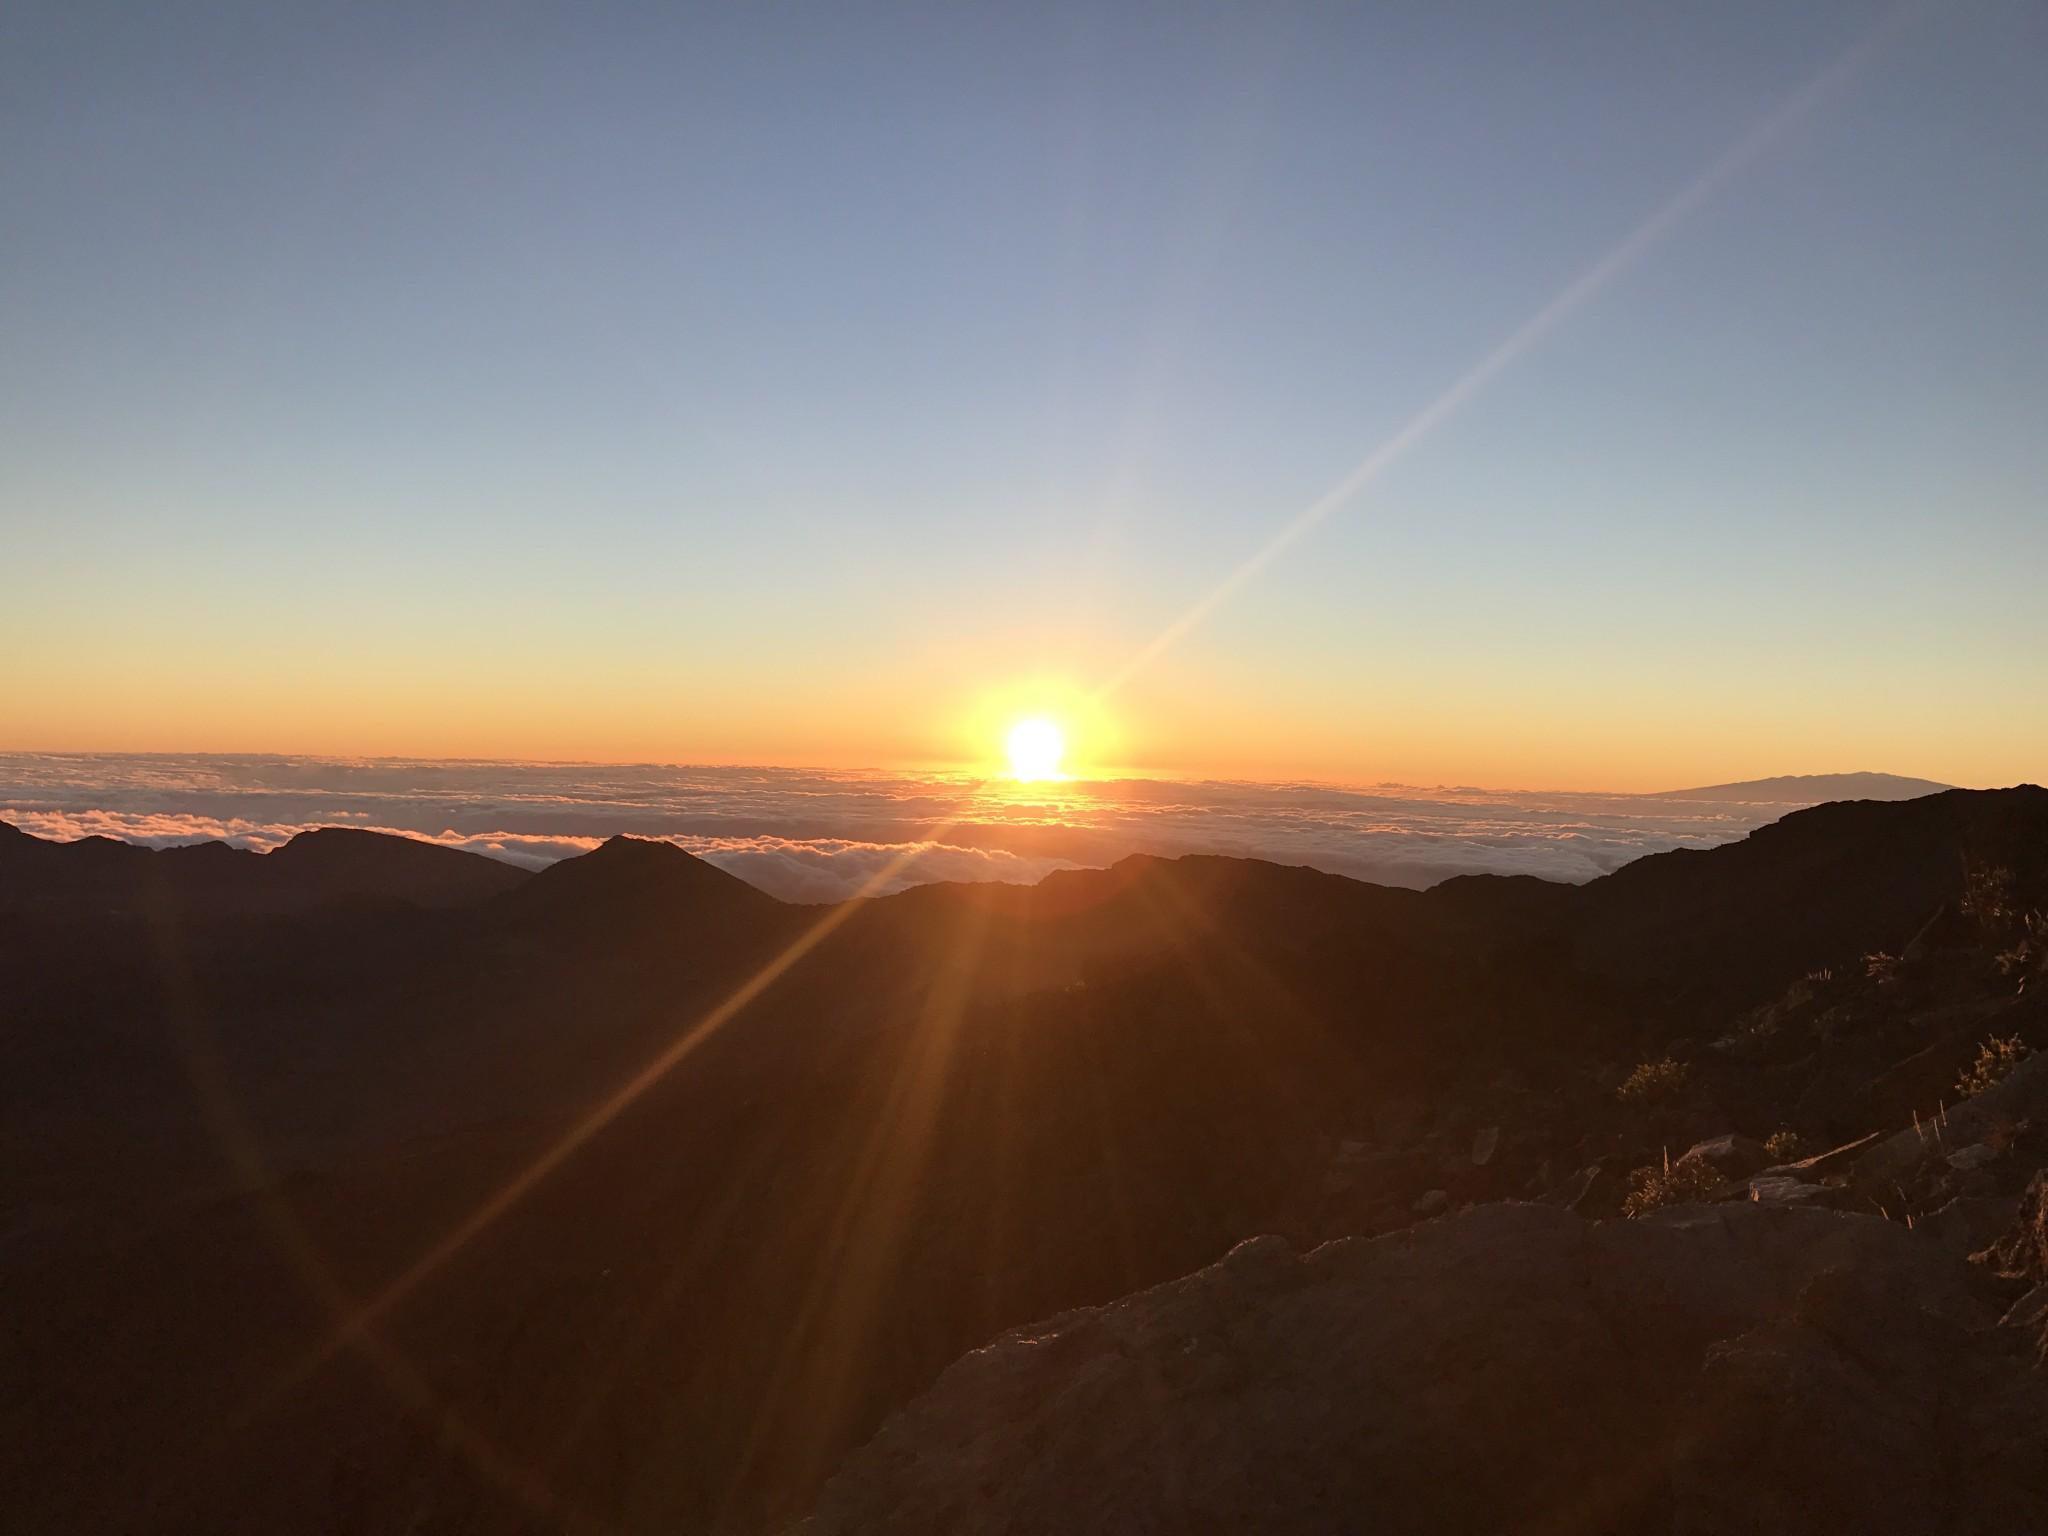 sunrise at haleakala national park, maui, the-alyst.com